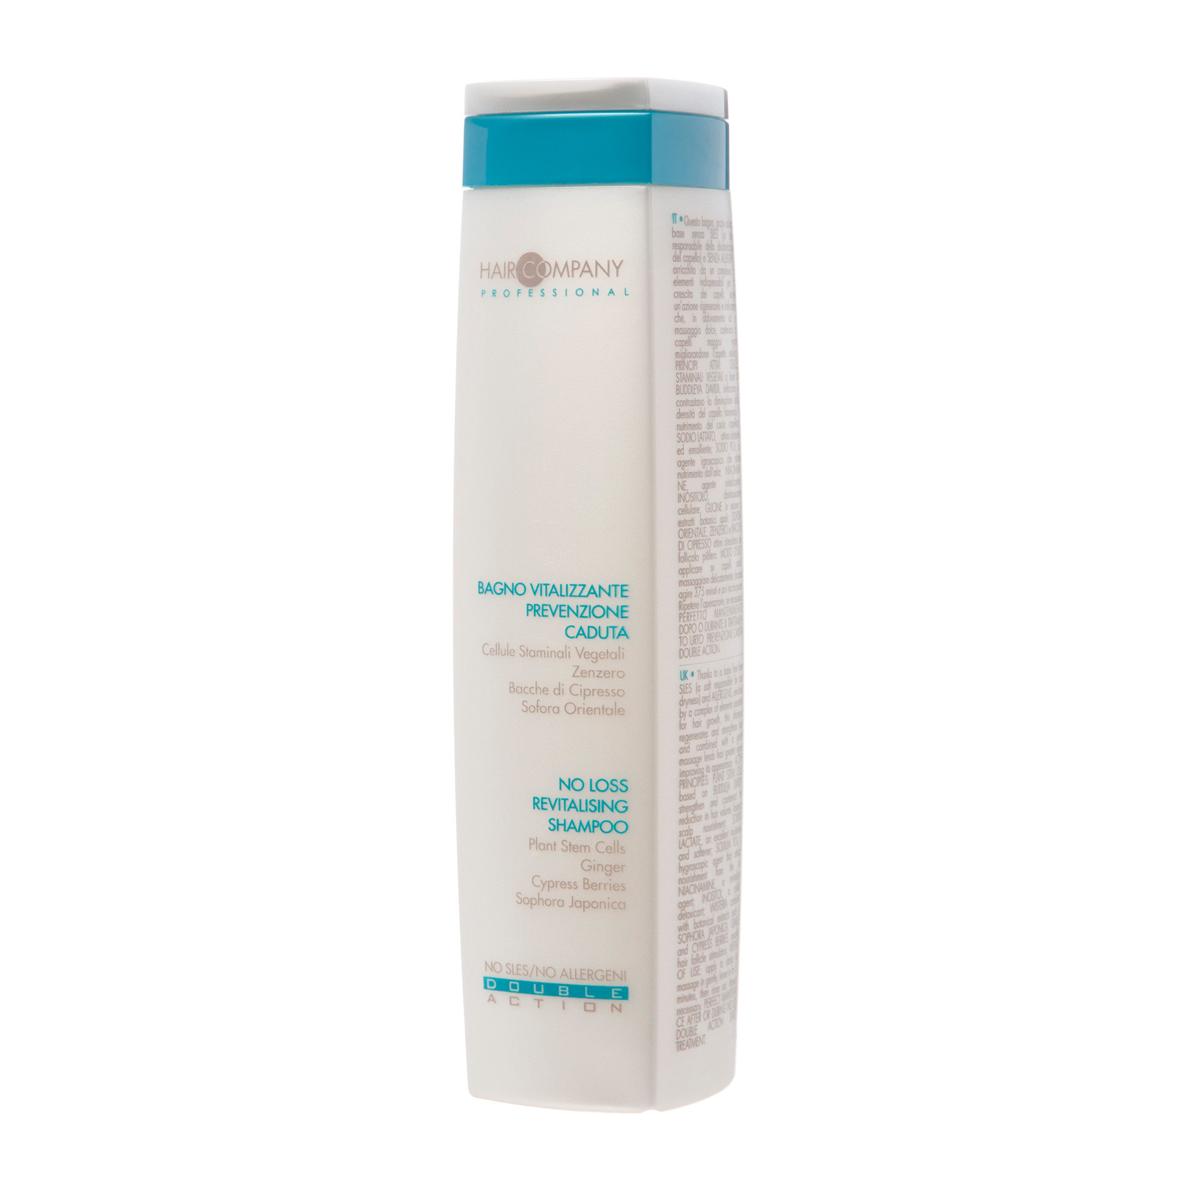 Hair Company Специальный шампунь против выпадения волос Double Action No Loss Revitalising Shampoo 250 мл weleda revitalising hair tonic